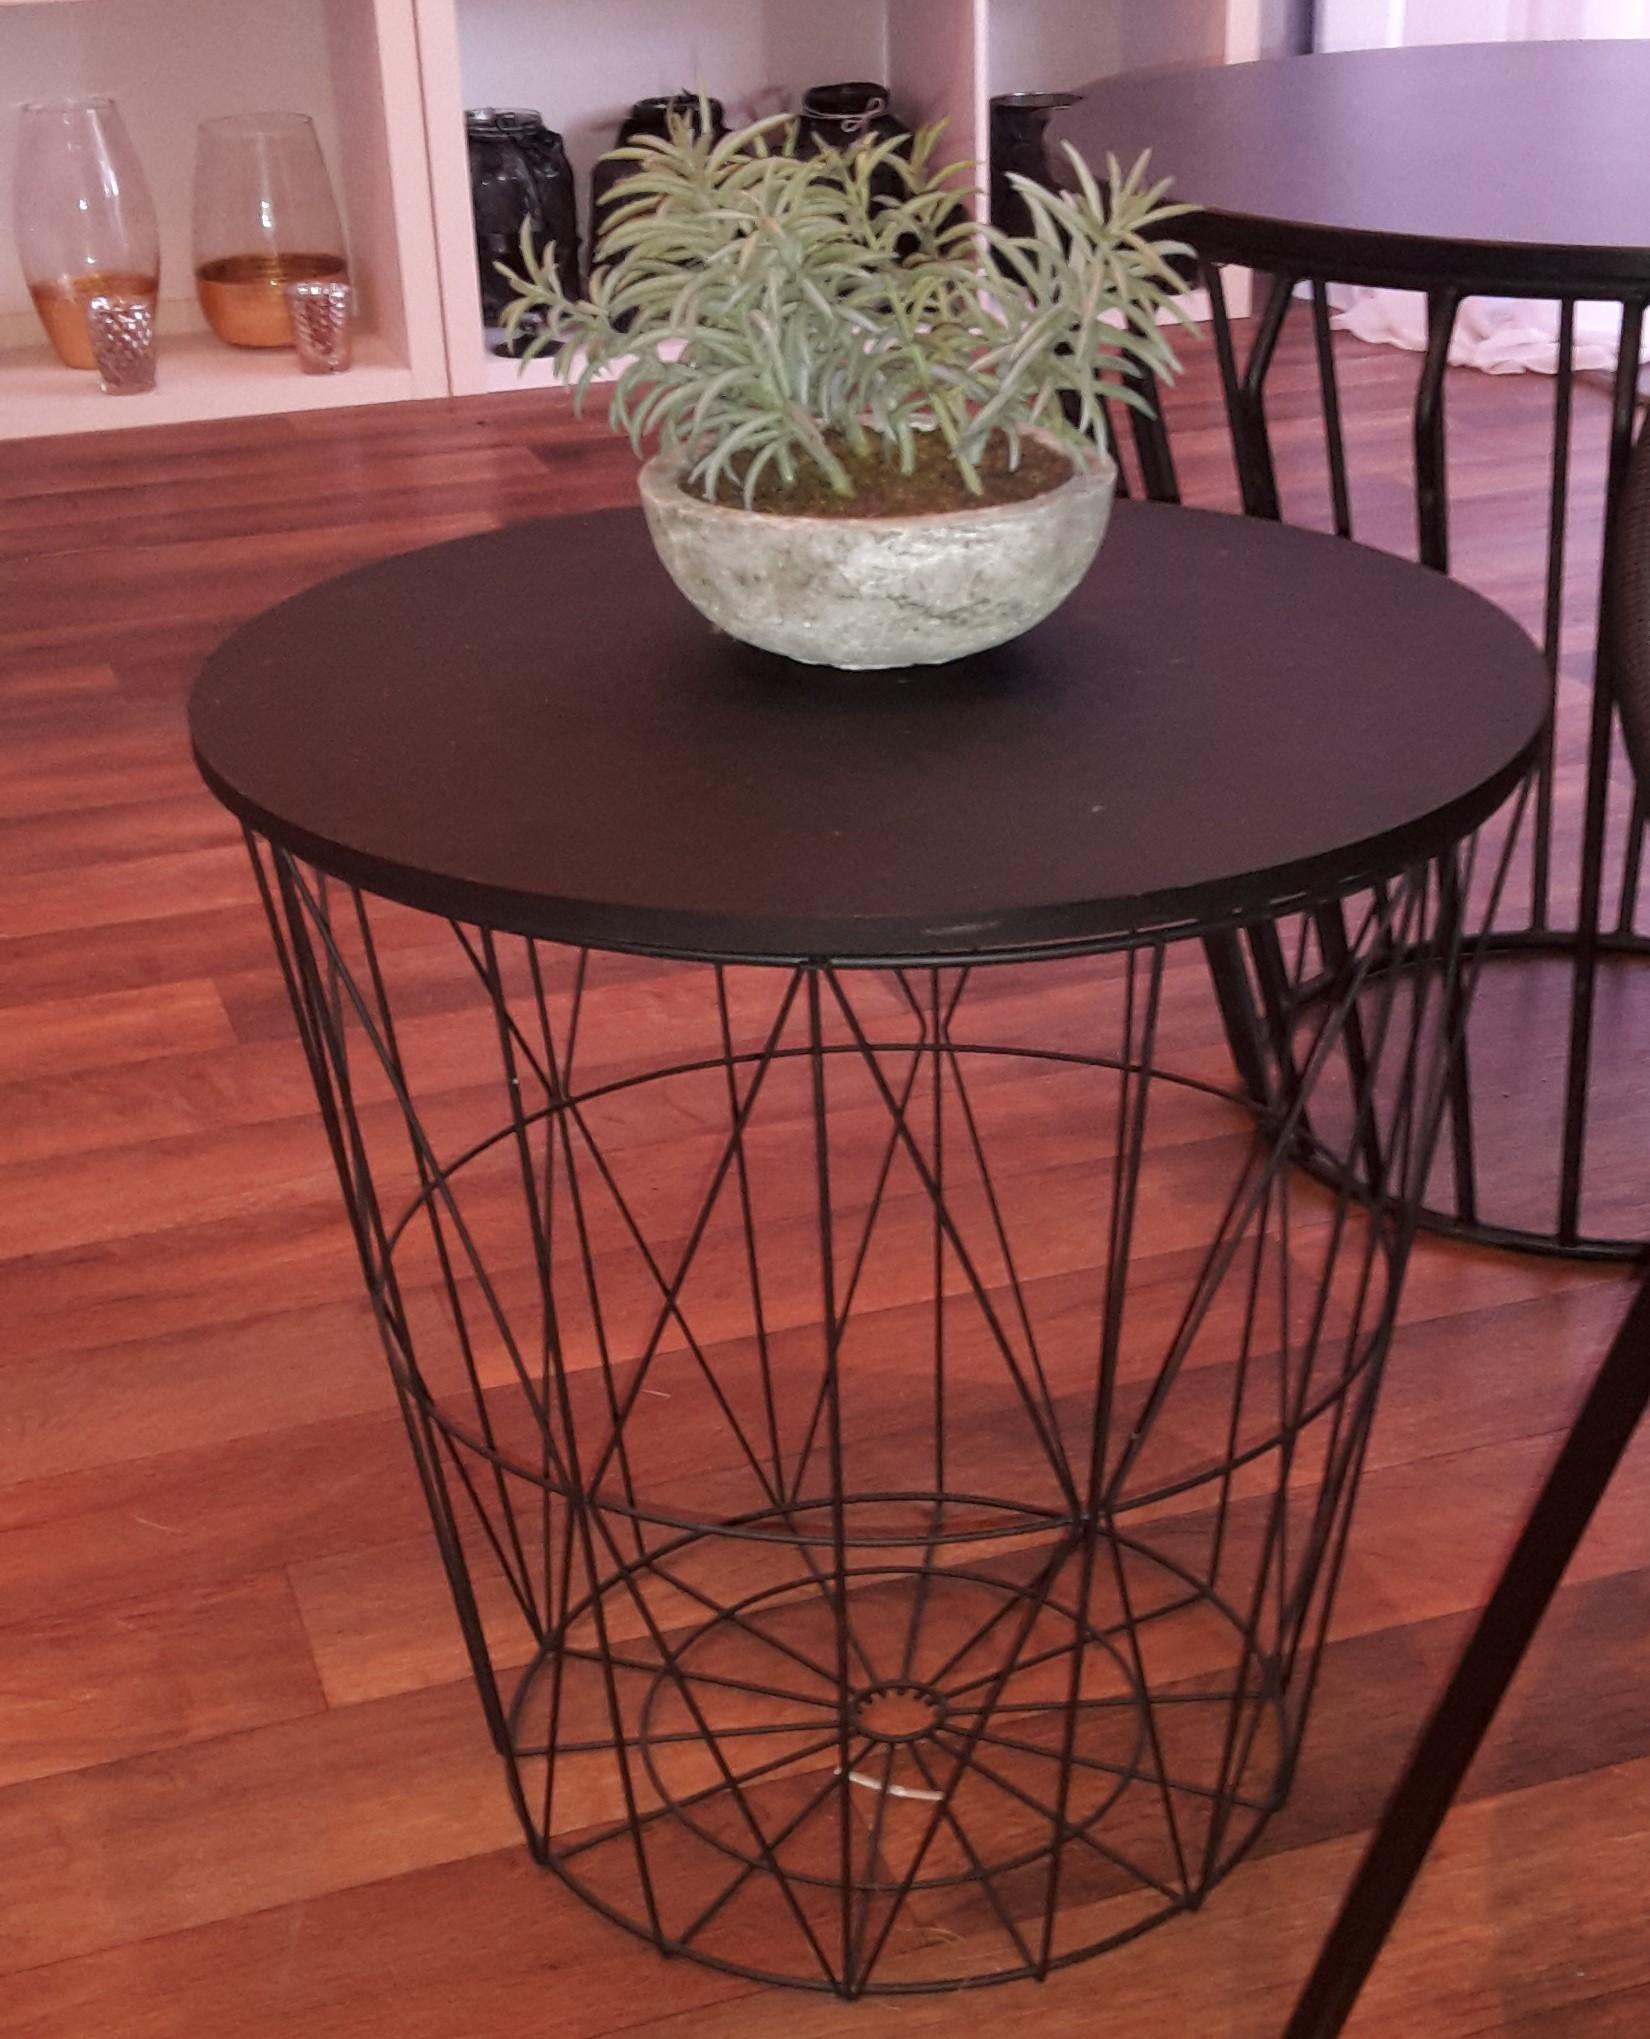 Small black wire side table - Splash Events, Noosa & Sunshine Coast